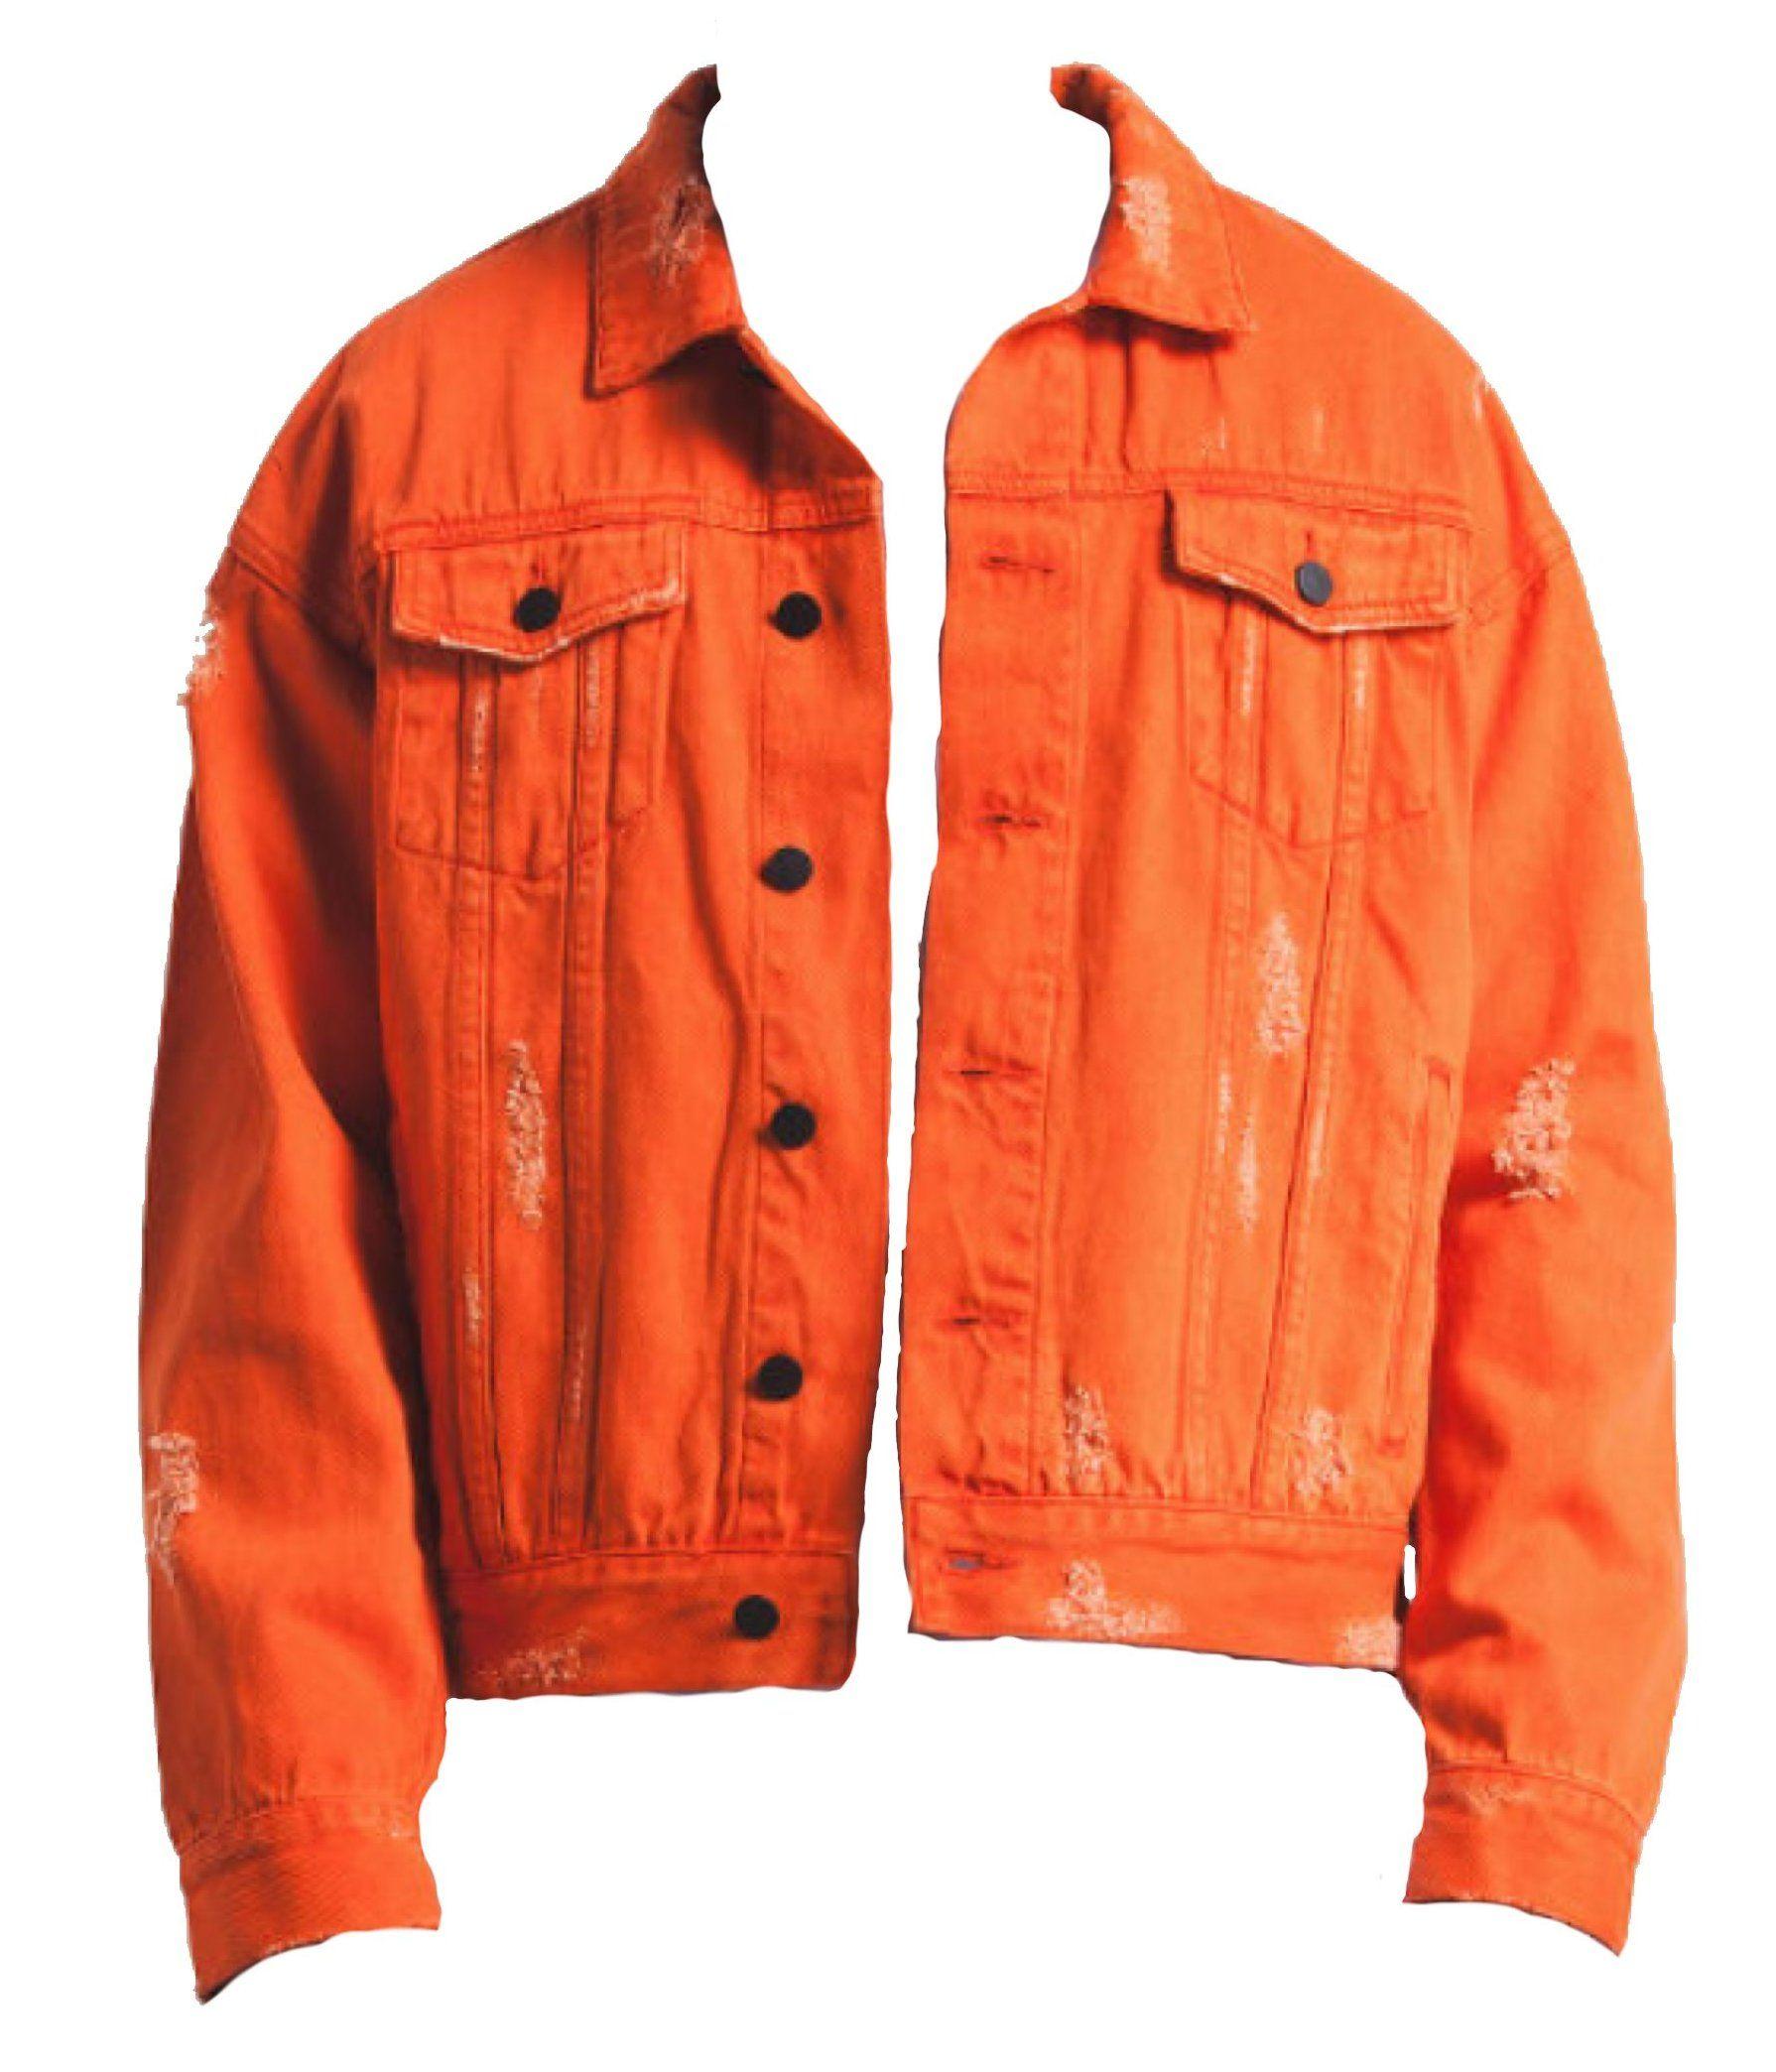 Orange Denim Jacket Outfit Men Orangedenimjacketoutfitmen Mens Outfits Denim Jacket Outfit Jacket Outfits [ 2088 x 1790 Pixel ]